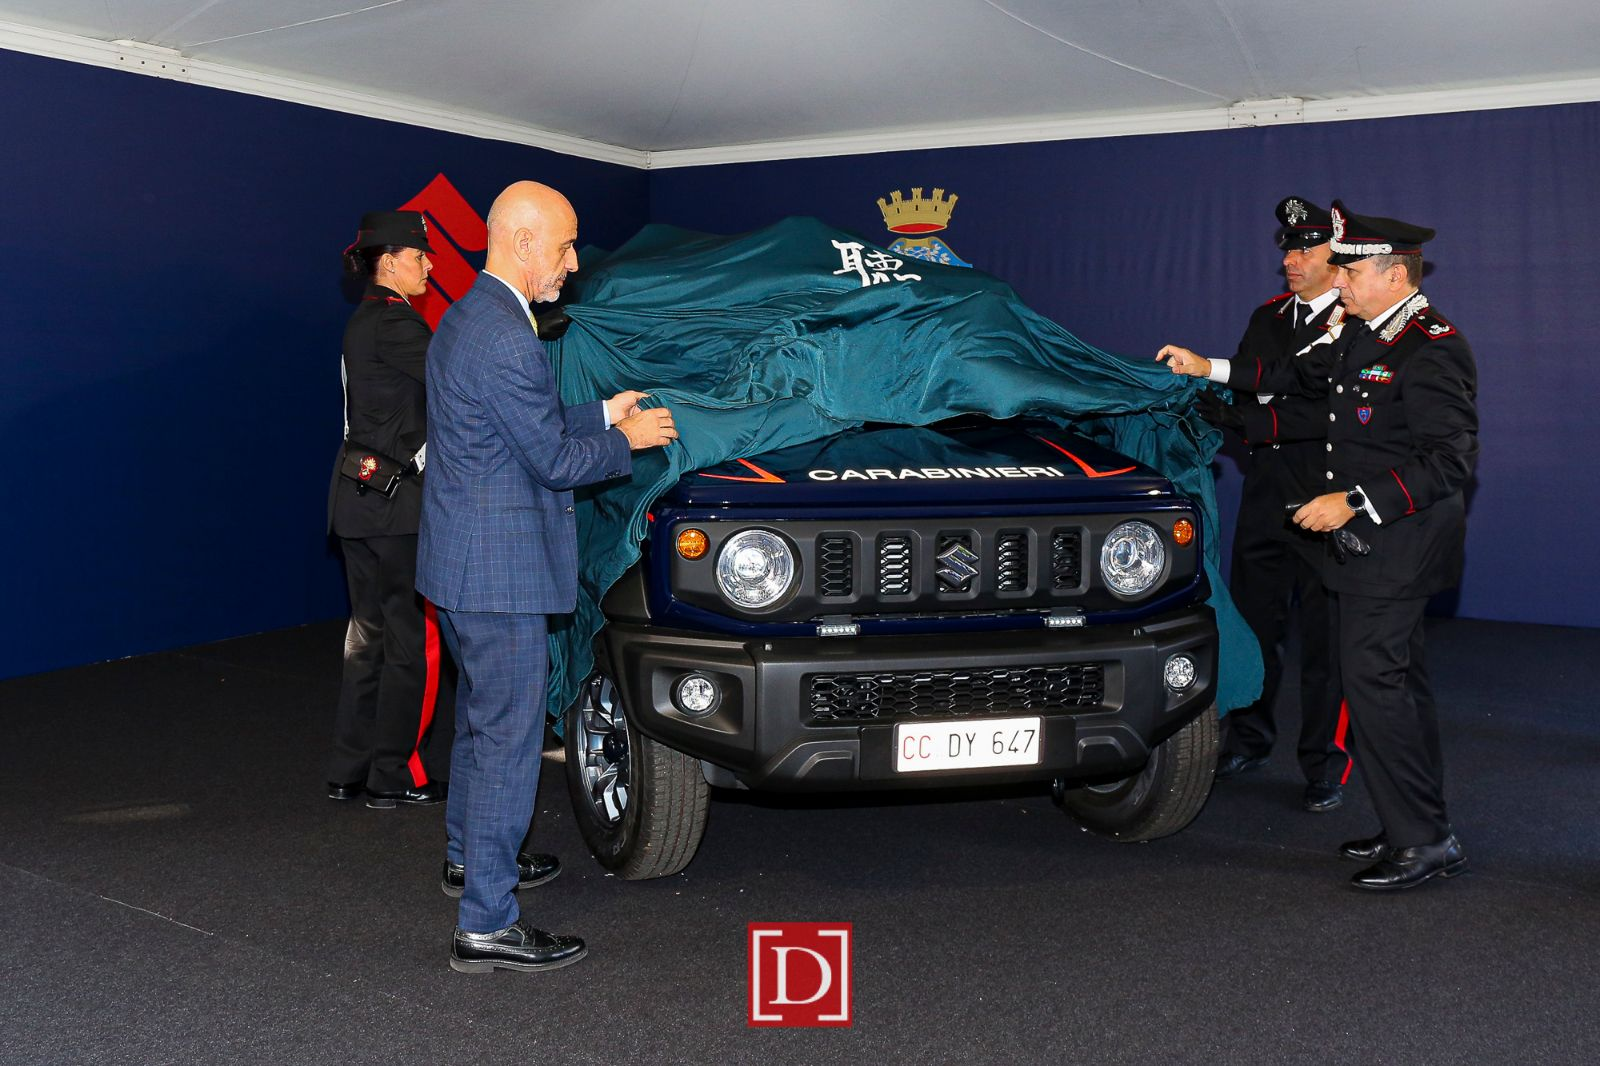 2019-10-23-suzuki-carabinieri-8976